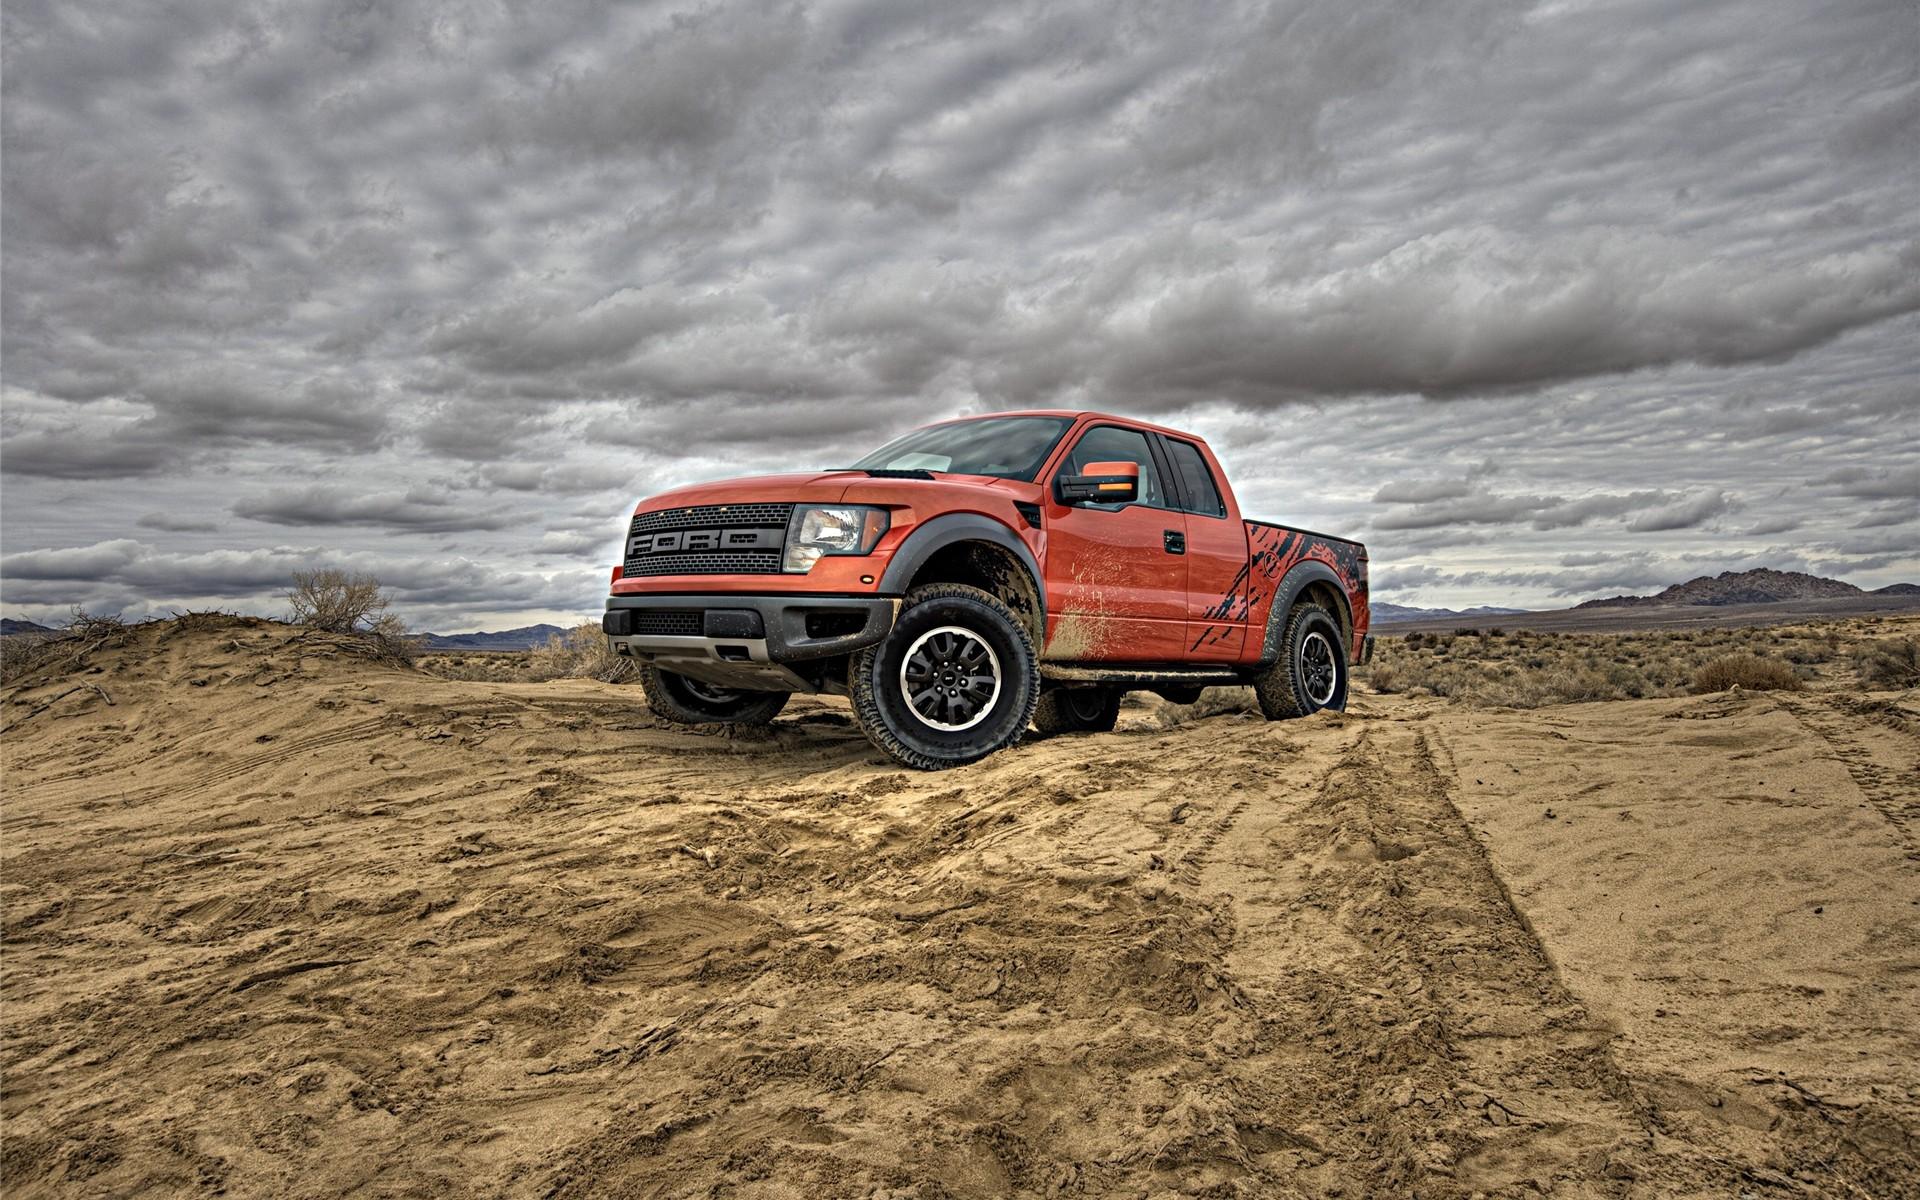 916 Ford Truck Wallpaper